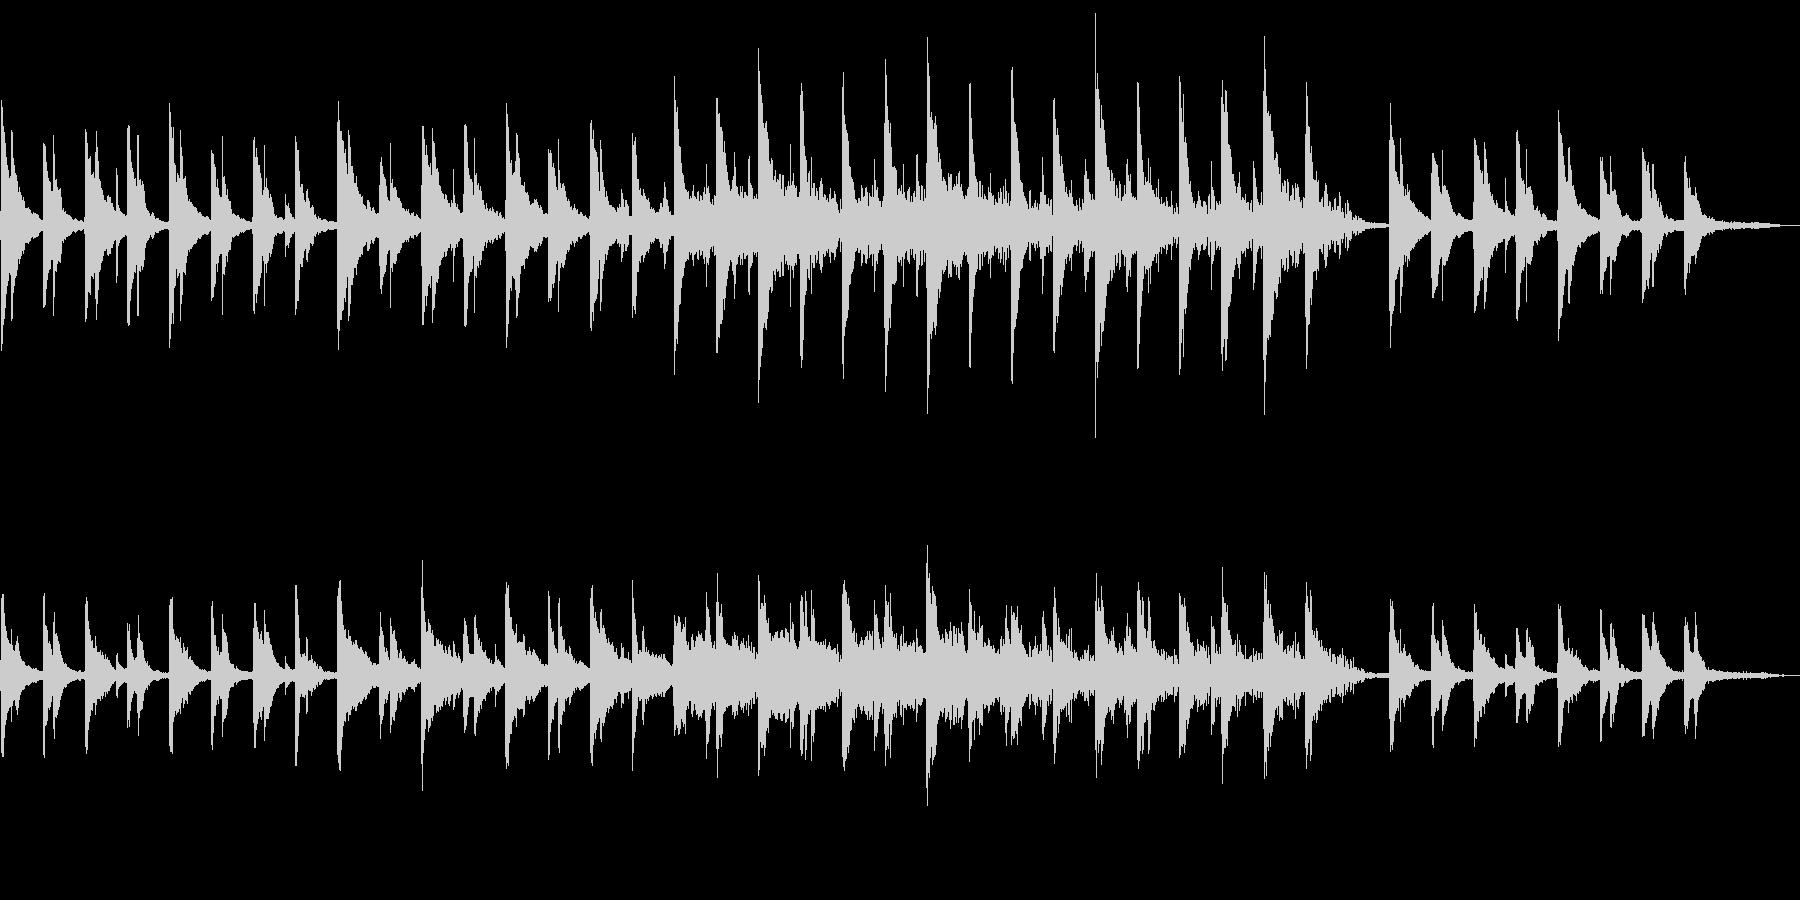 SIZUKUの未再生の波形